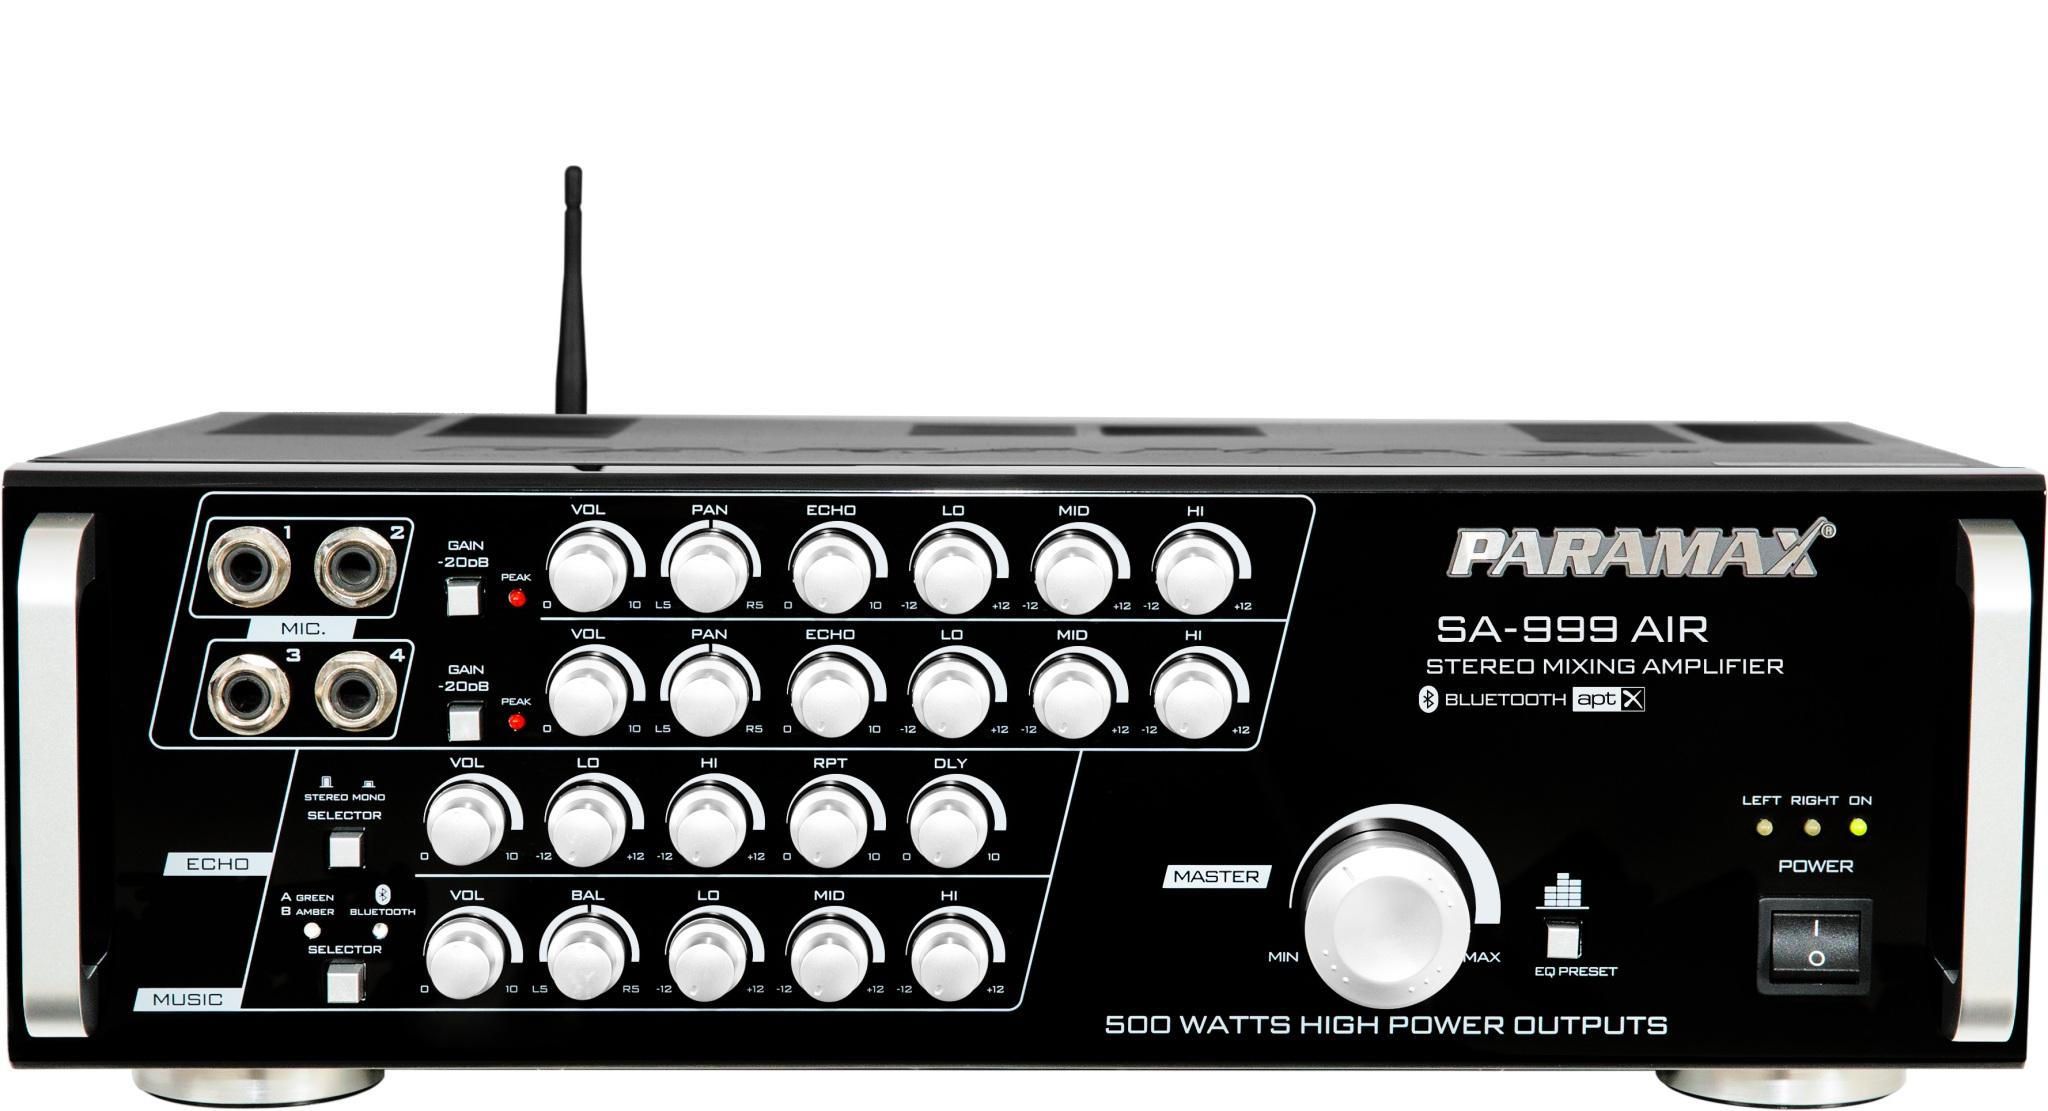 ampli-paramax-sa-999-air.jpg